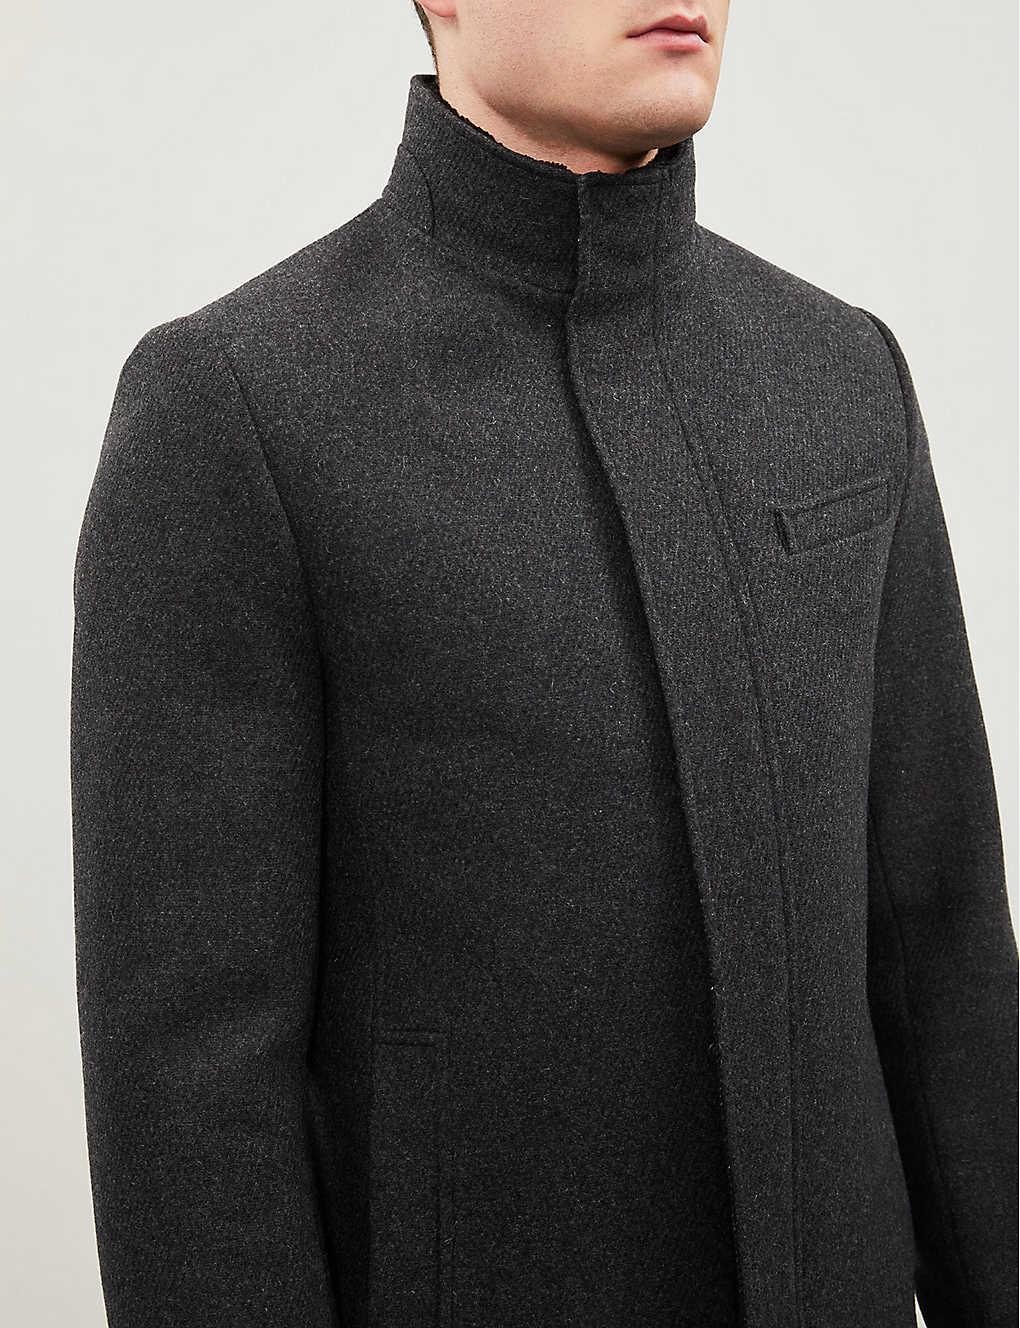 39063a693b17 ... Marven funnel neck wool-blend coat - Charcoal ...